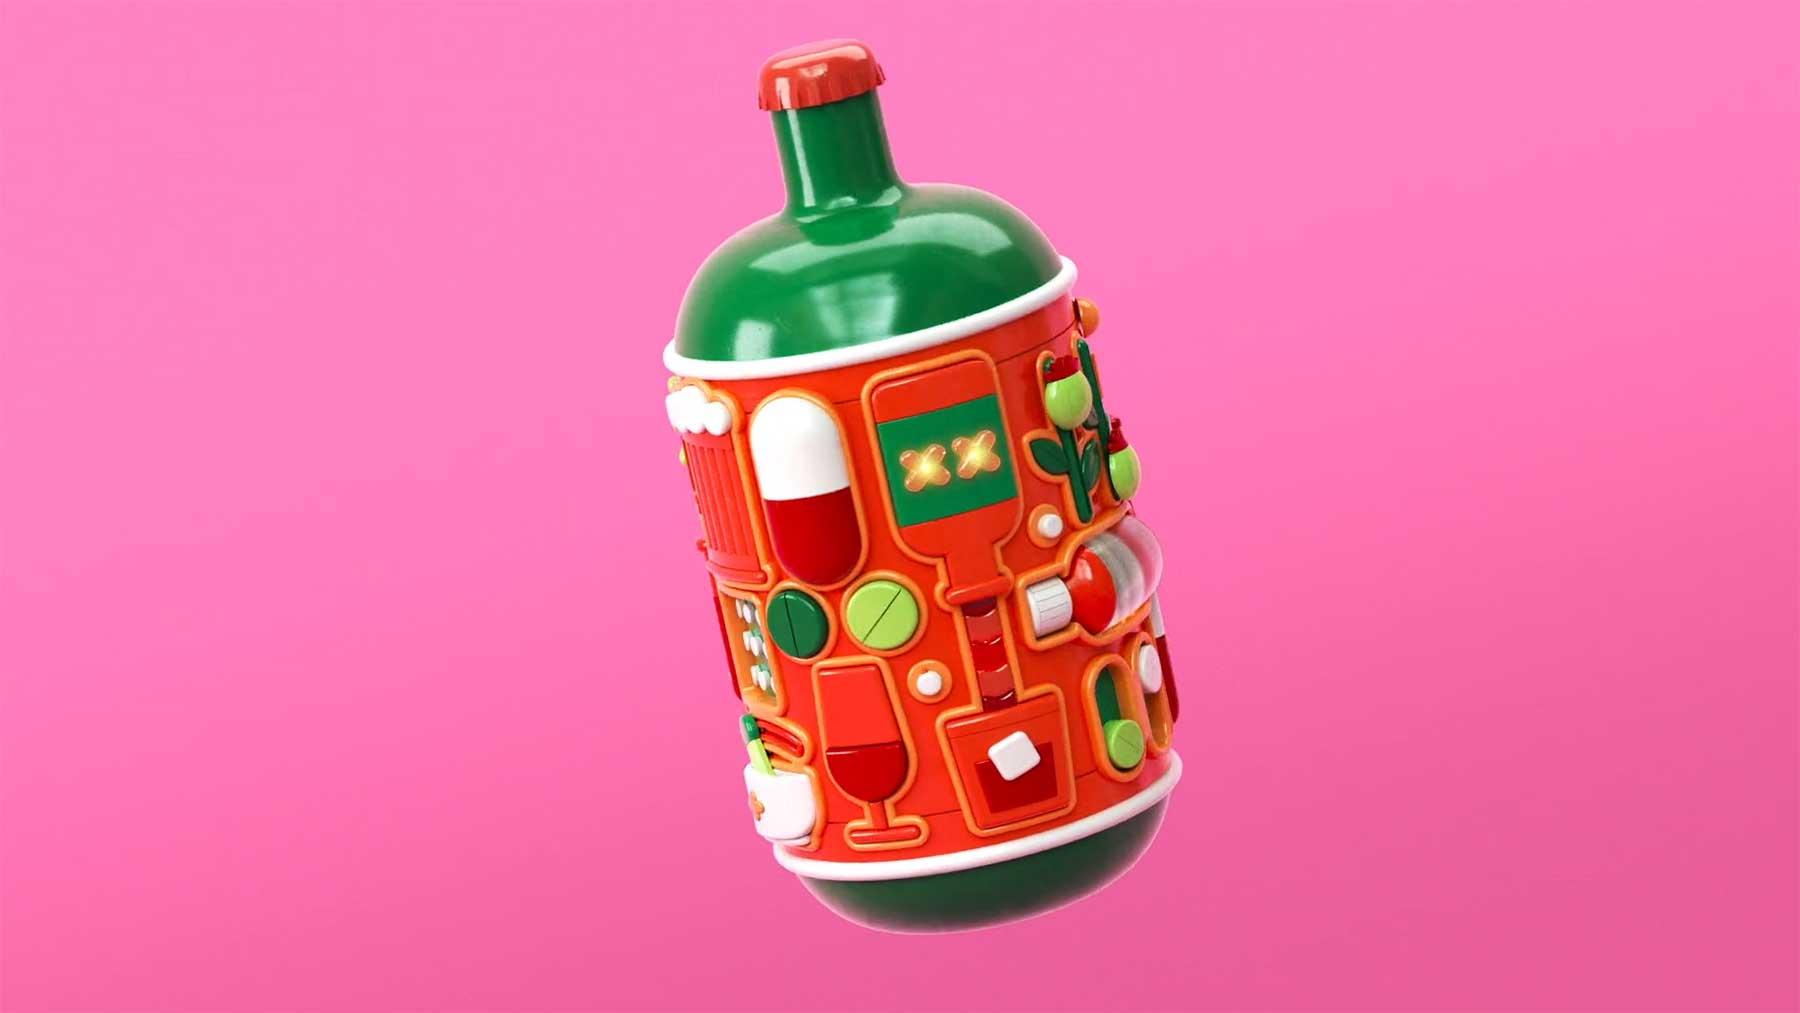 Kinderspielzeuge mit Suchtpotenzialen fun-and-games-bullpen